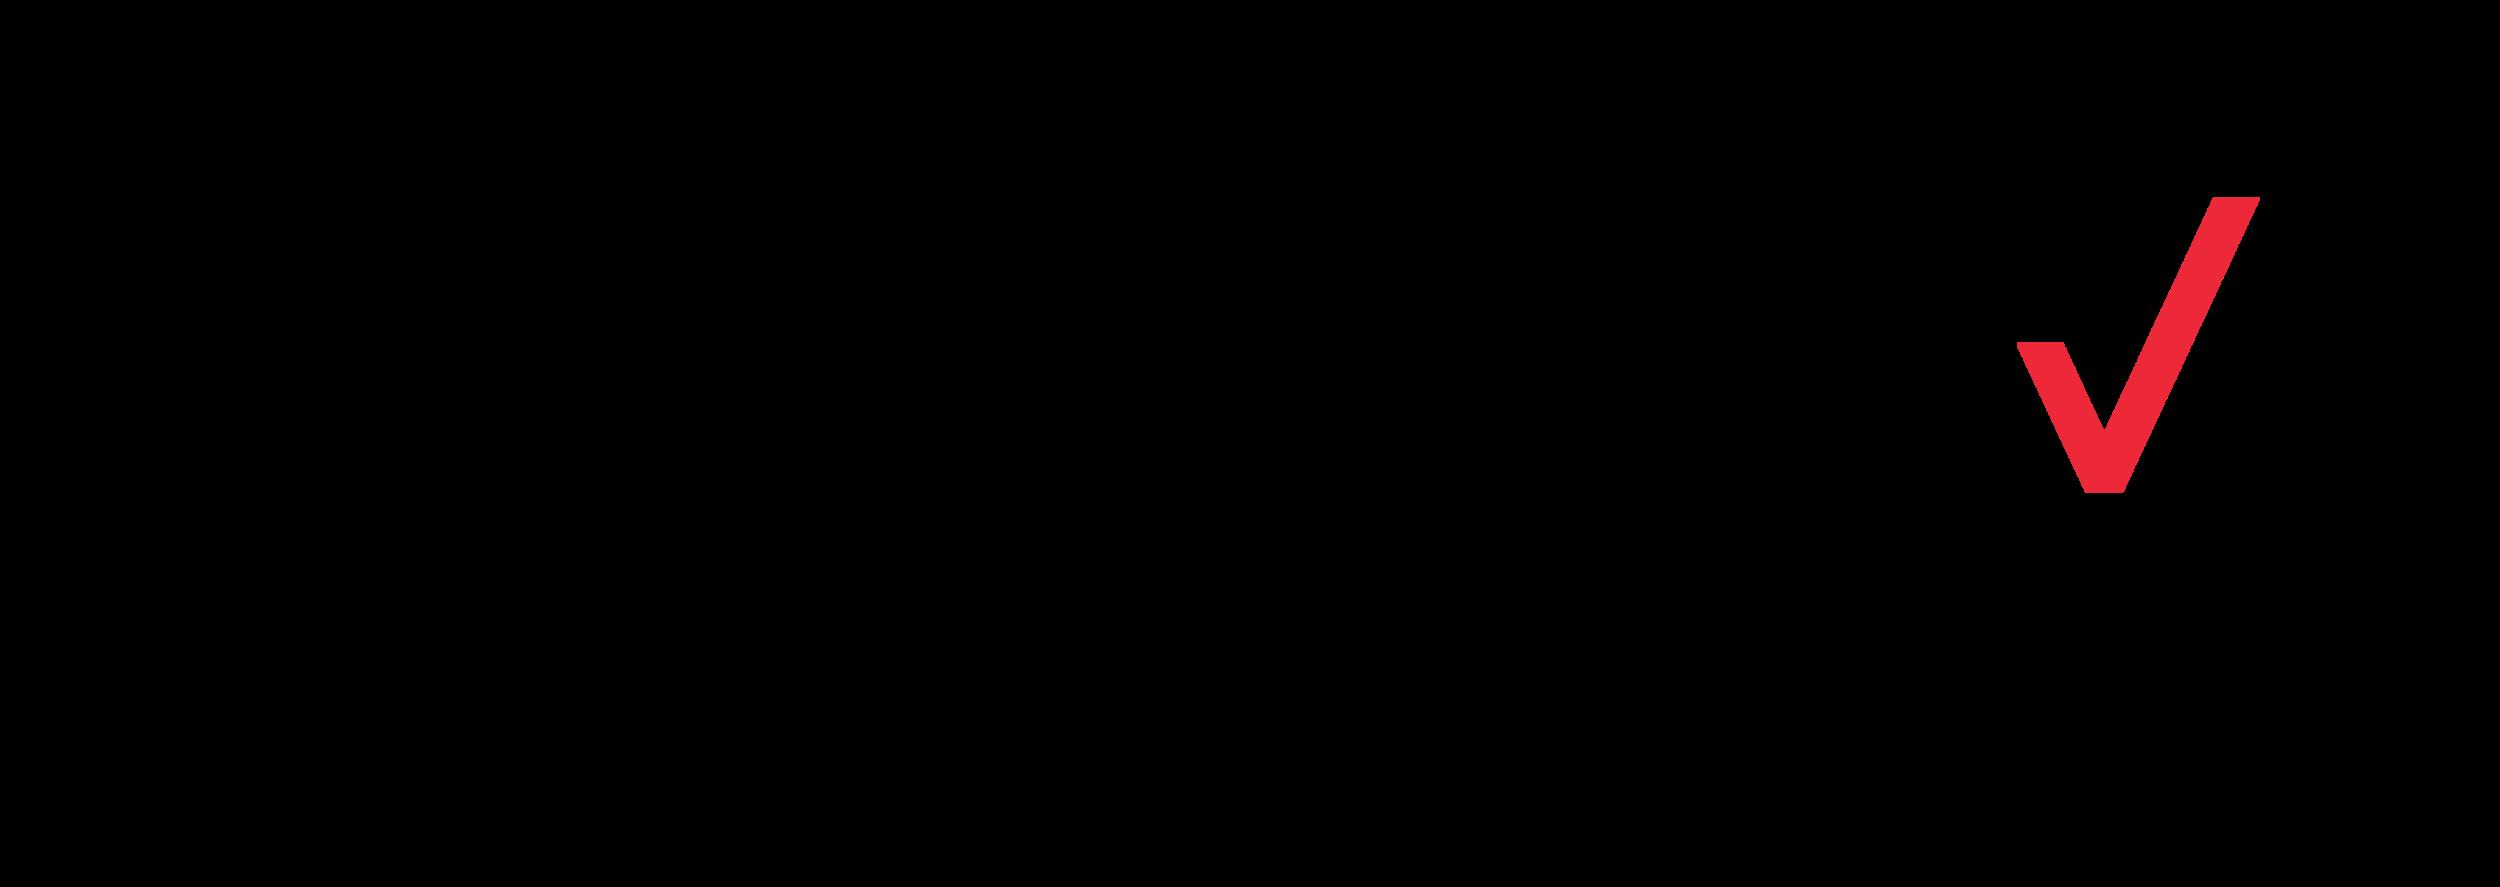 Verizon_RGB_Logo-Black.png